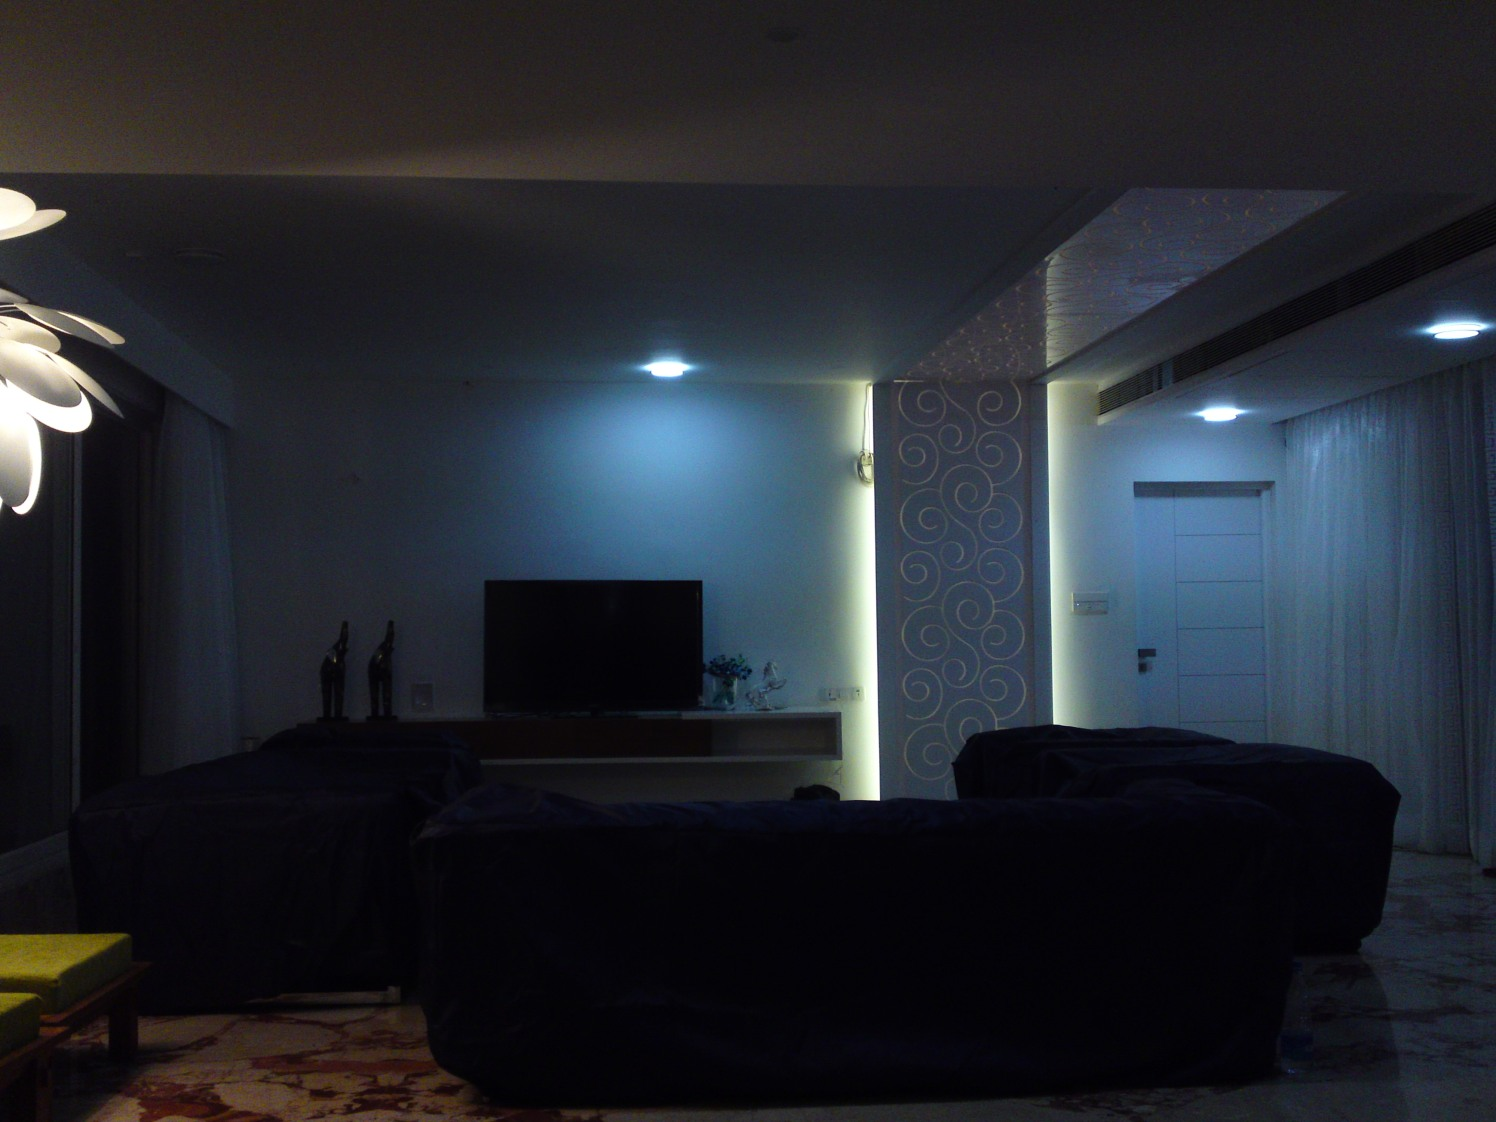 Modern Living Room by Deepti Srivastava Living-room Contemporary | Interior Design Photos & Ideas